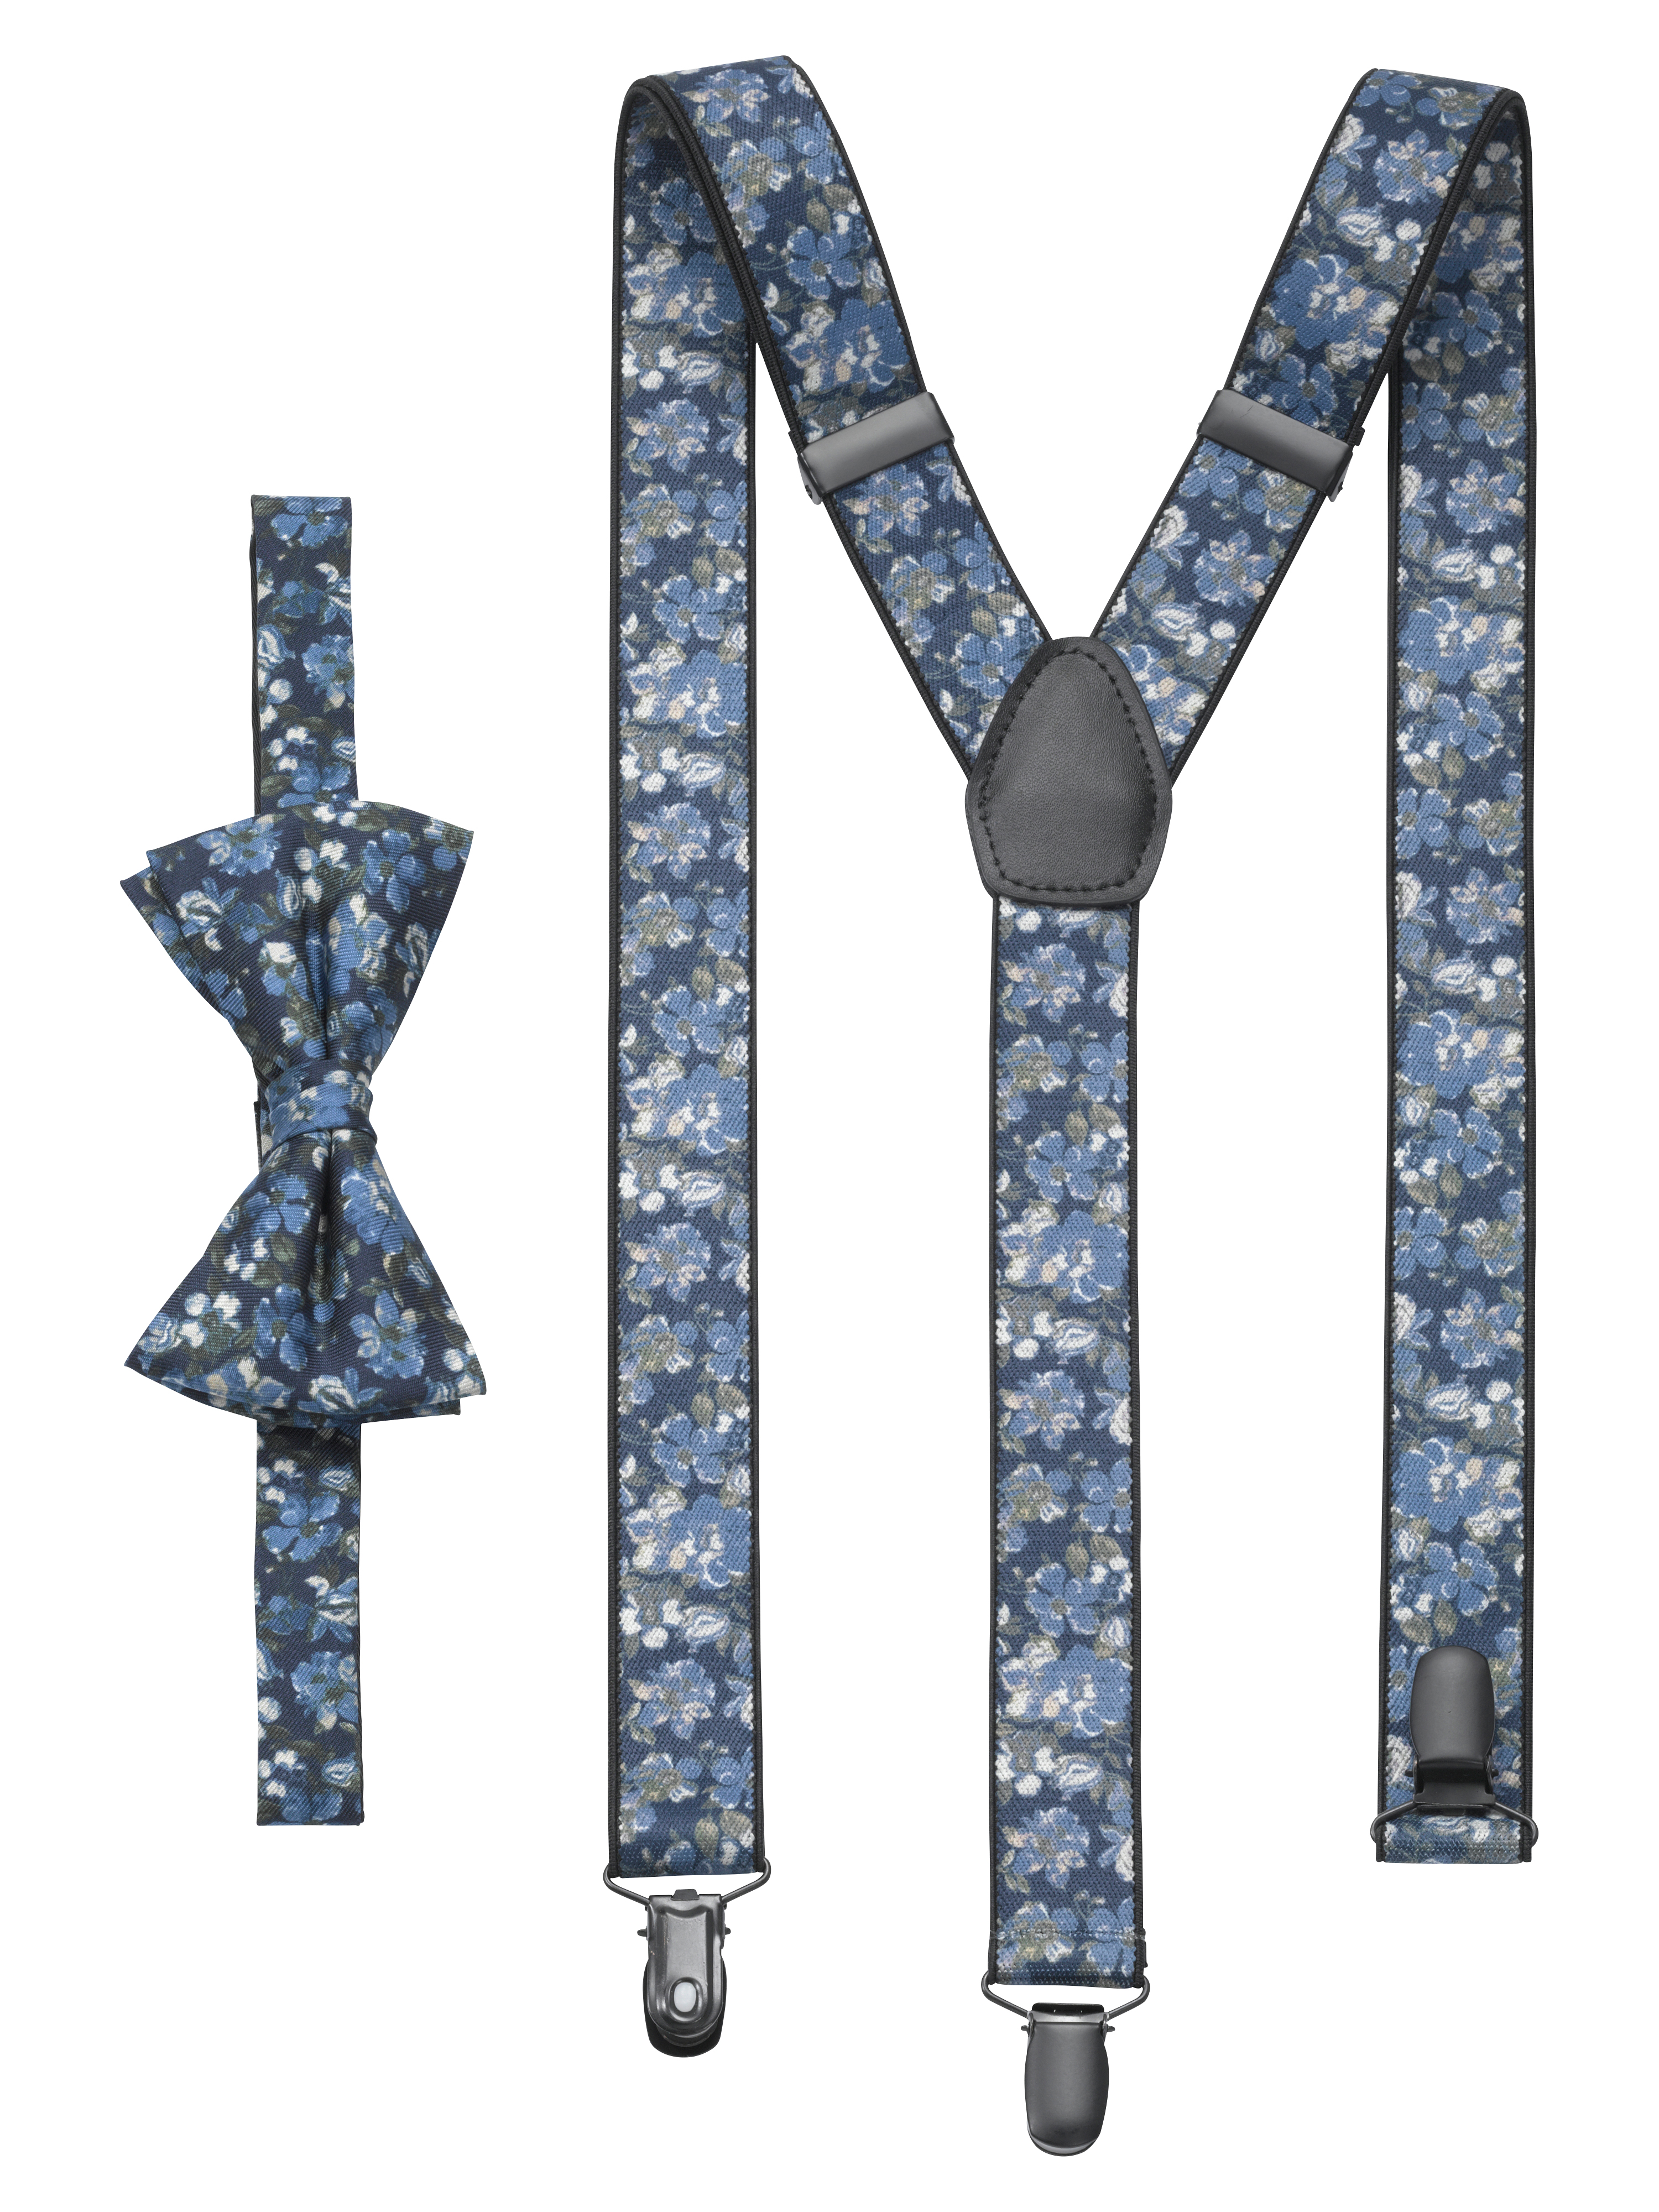 OLYMP Set Hosenträger/Fliege, Marine, 2-teilig | Accessoires > Gürtel > Hosenträger | Marine | Baumwolle | OLYMP Set Hosenträger/Fliege